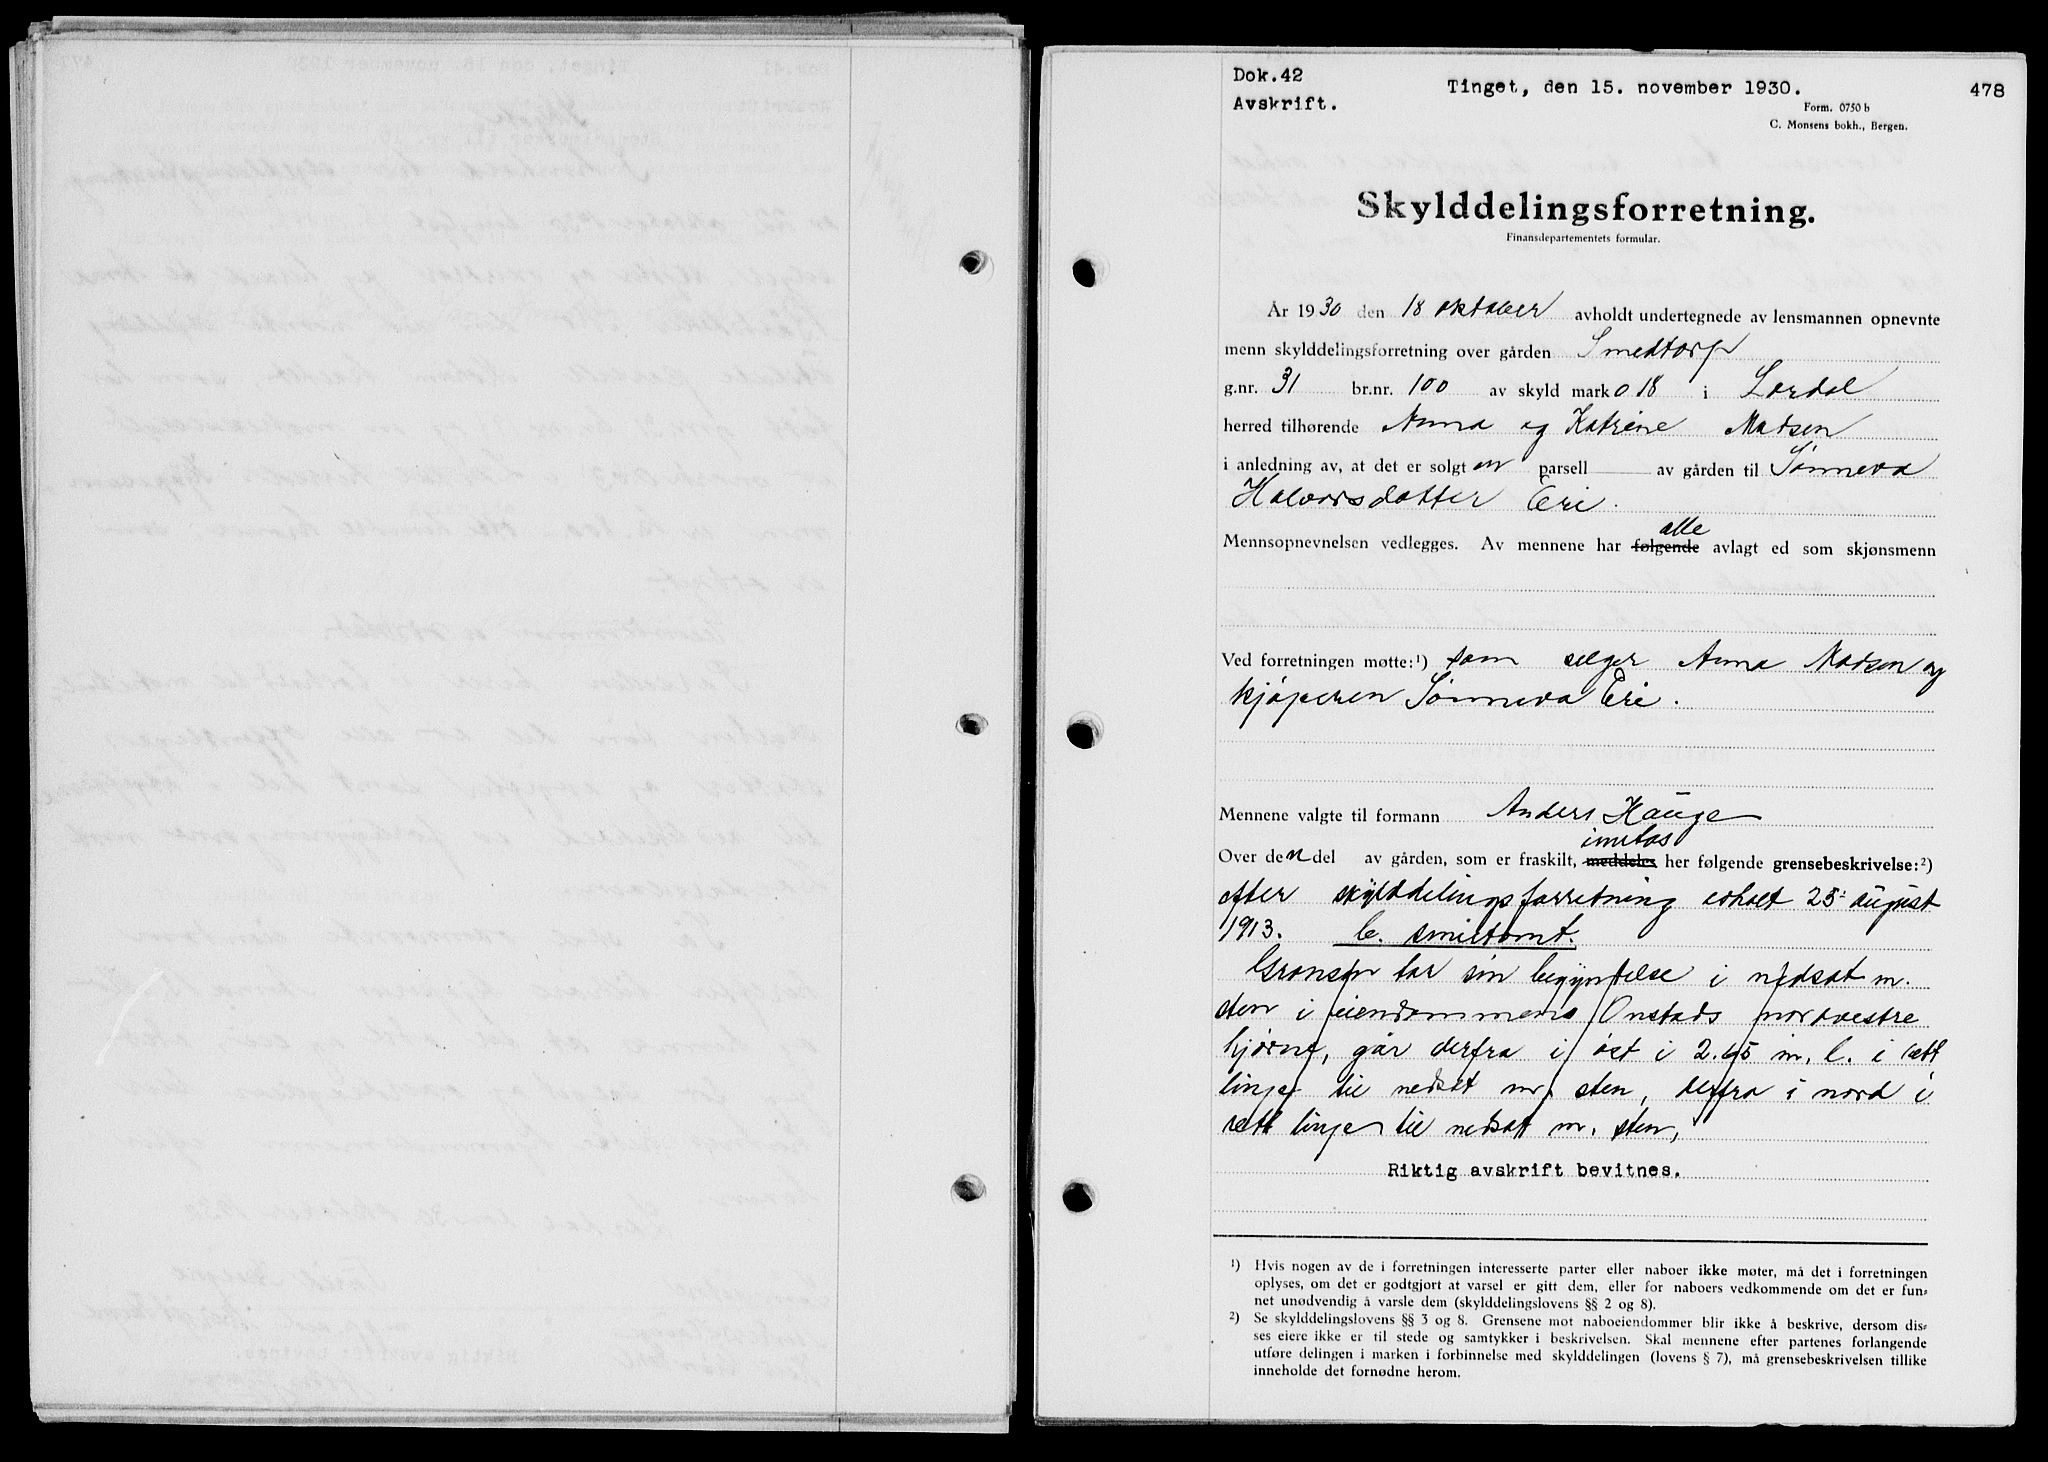 SAB, Indre Sogn sorenskriveri, G/Gb/Gba/L0025: Pantebok nr. II.B.25, 1930-1930, s. 478